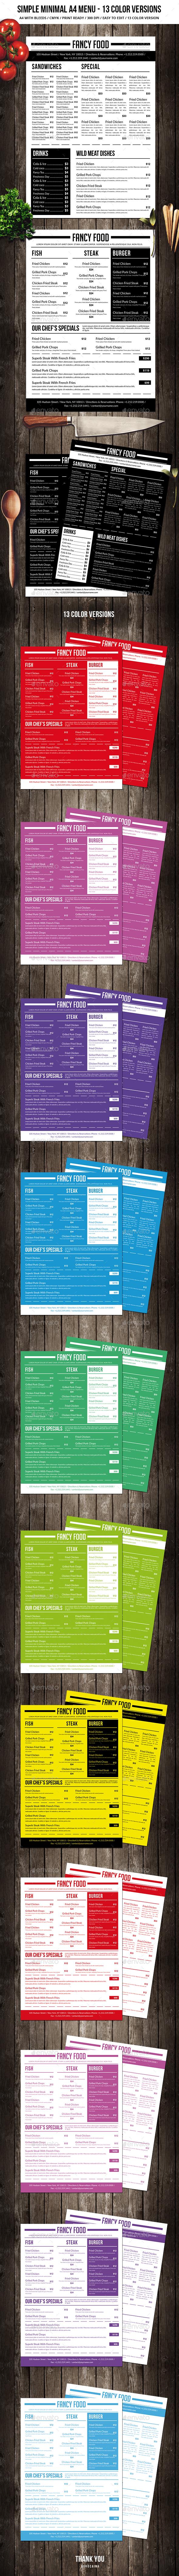 Simple A4 Minimal A4 Menu - 13 Color Versions - Food Menus Print Templates